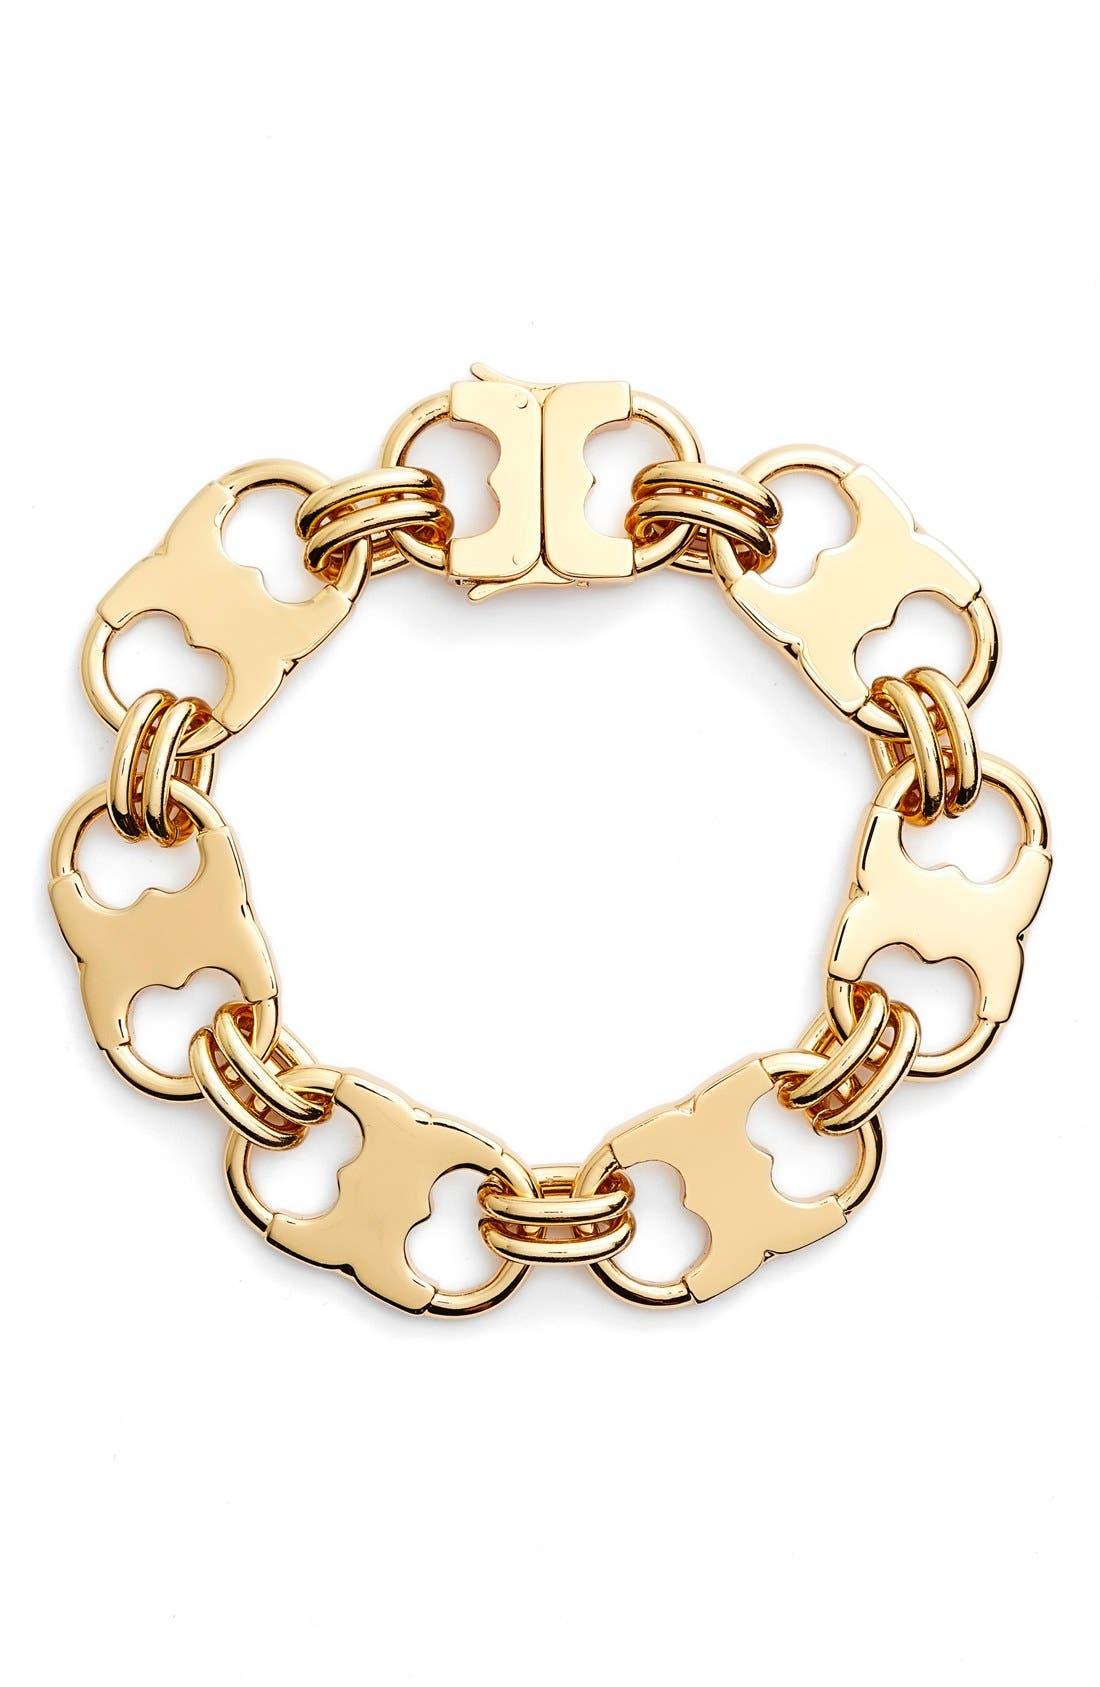 Tory Burch 'Gemini Link' Bracelet